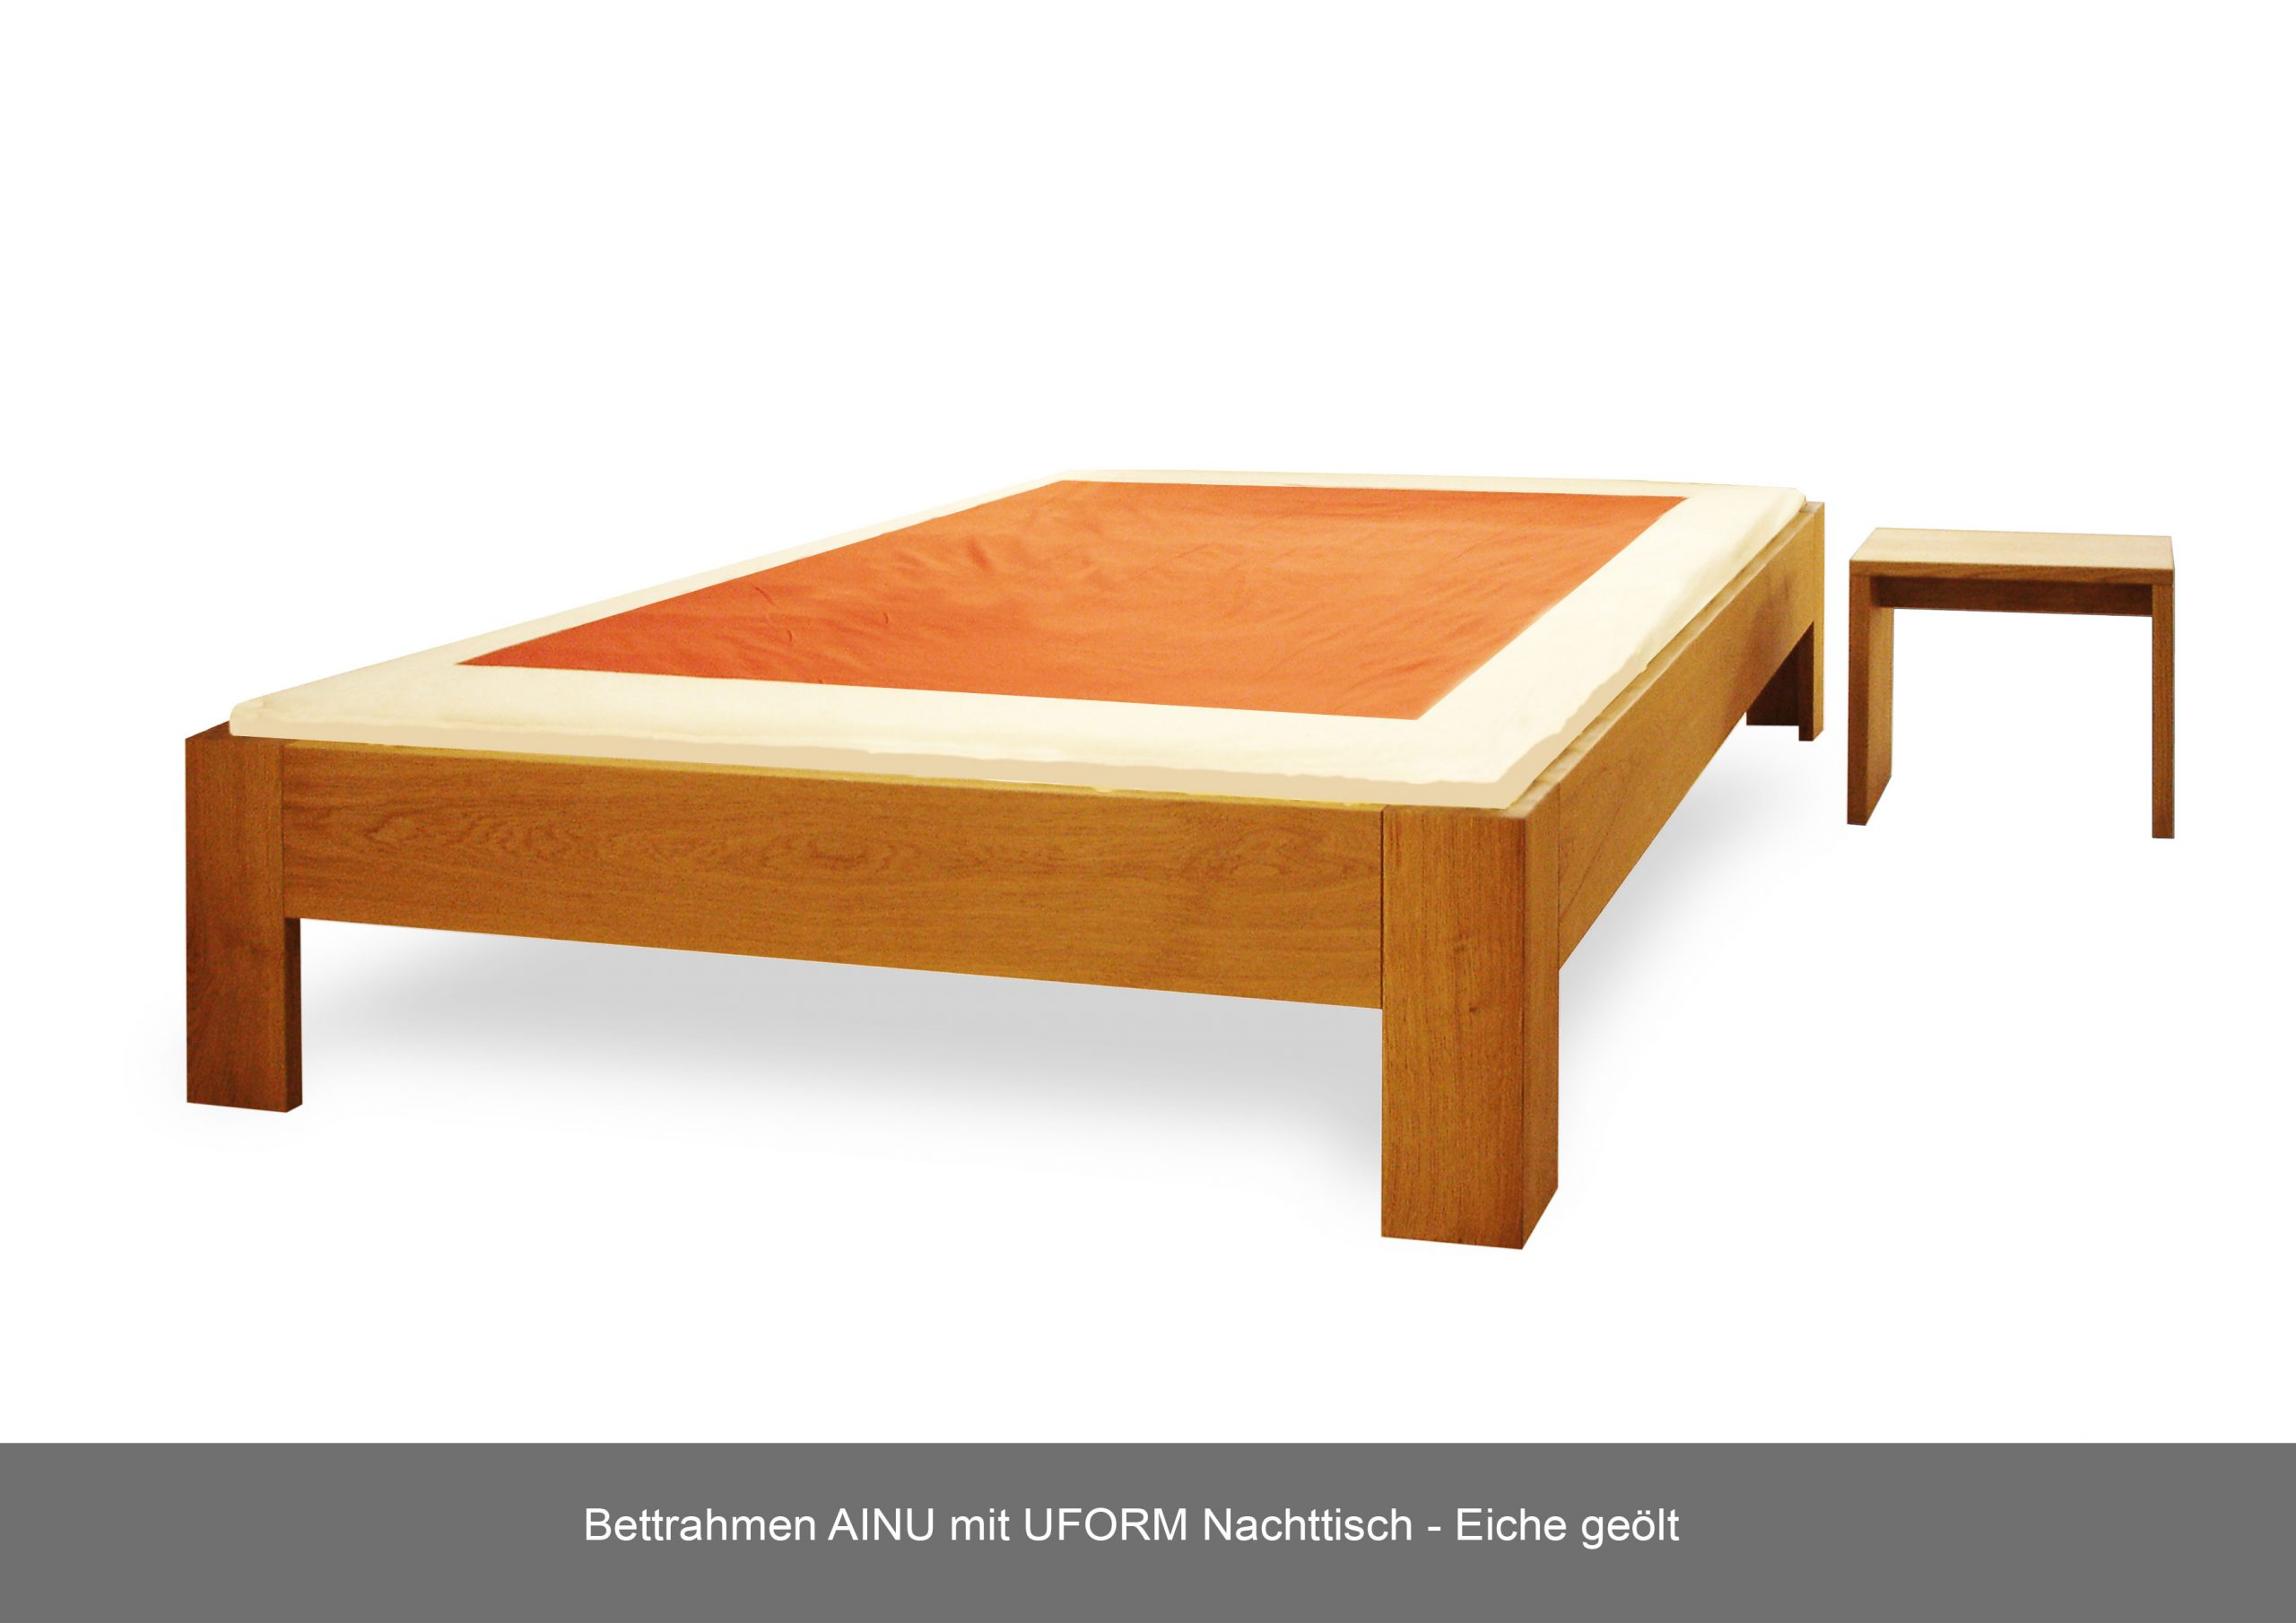 Bettrahmen AINU Massivholz Nachttisch U-Form Eiche geölt